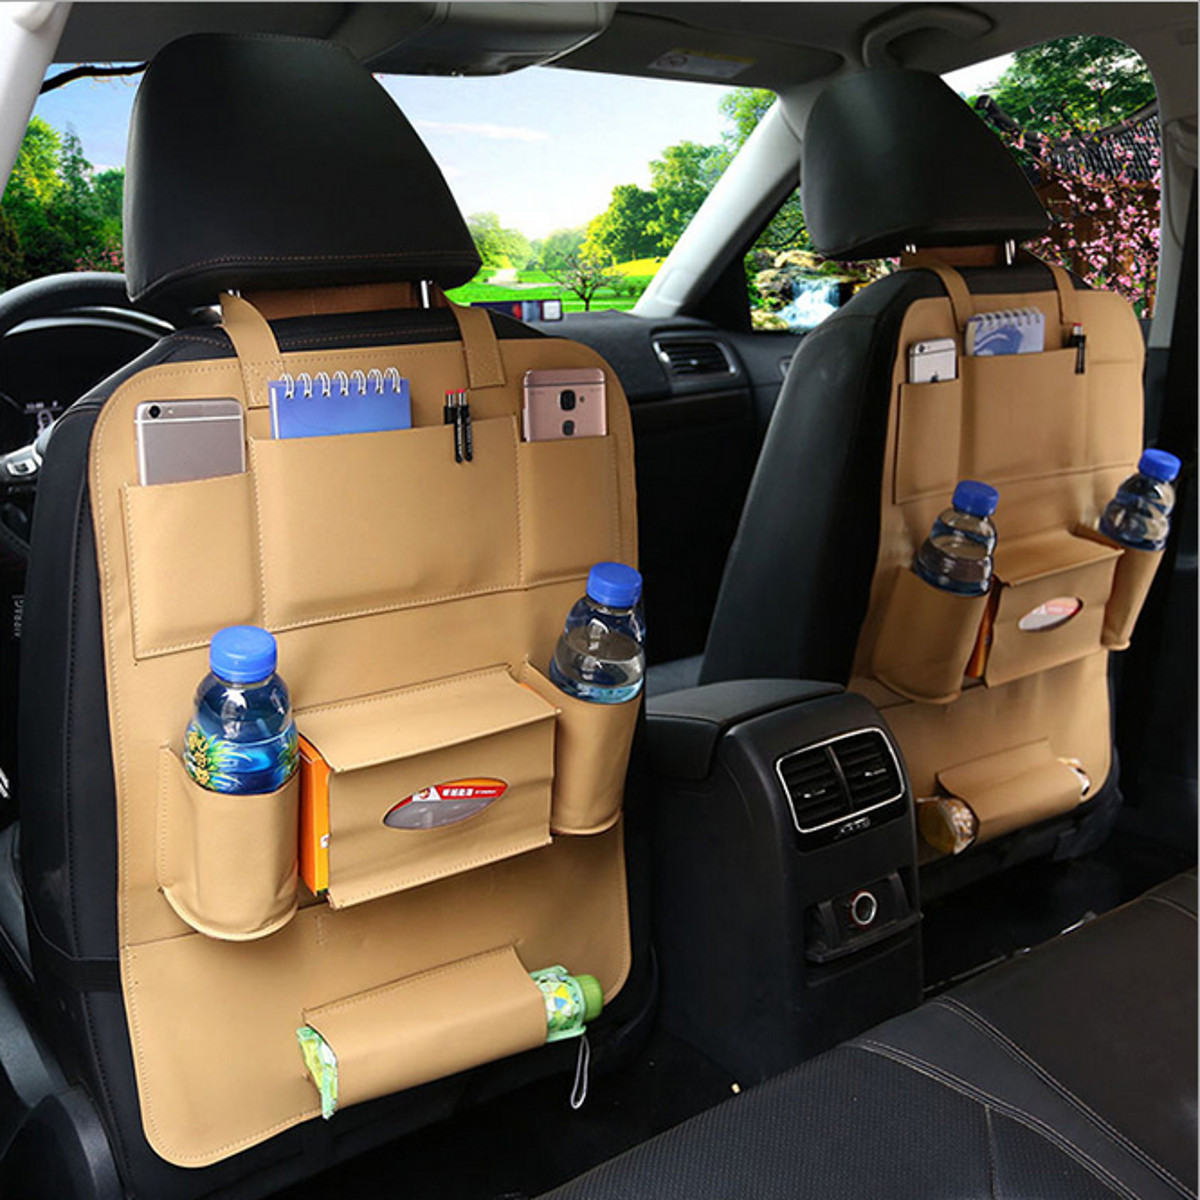 Beige/Brown/Black Auto Car Vehicle Seat Back Organizer Storage Bag Pocket Phone Holder Leather for Cars SUVs Trucks